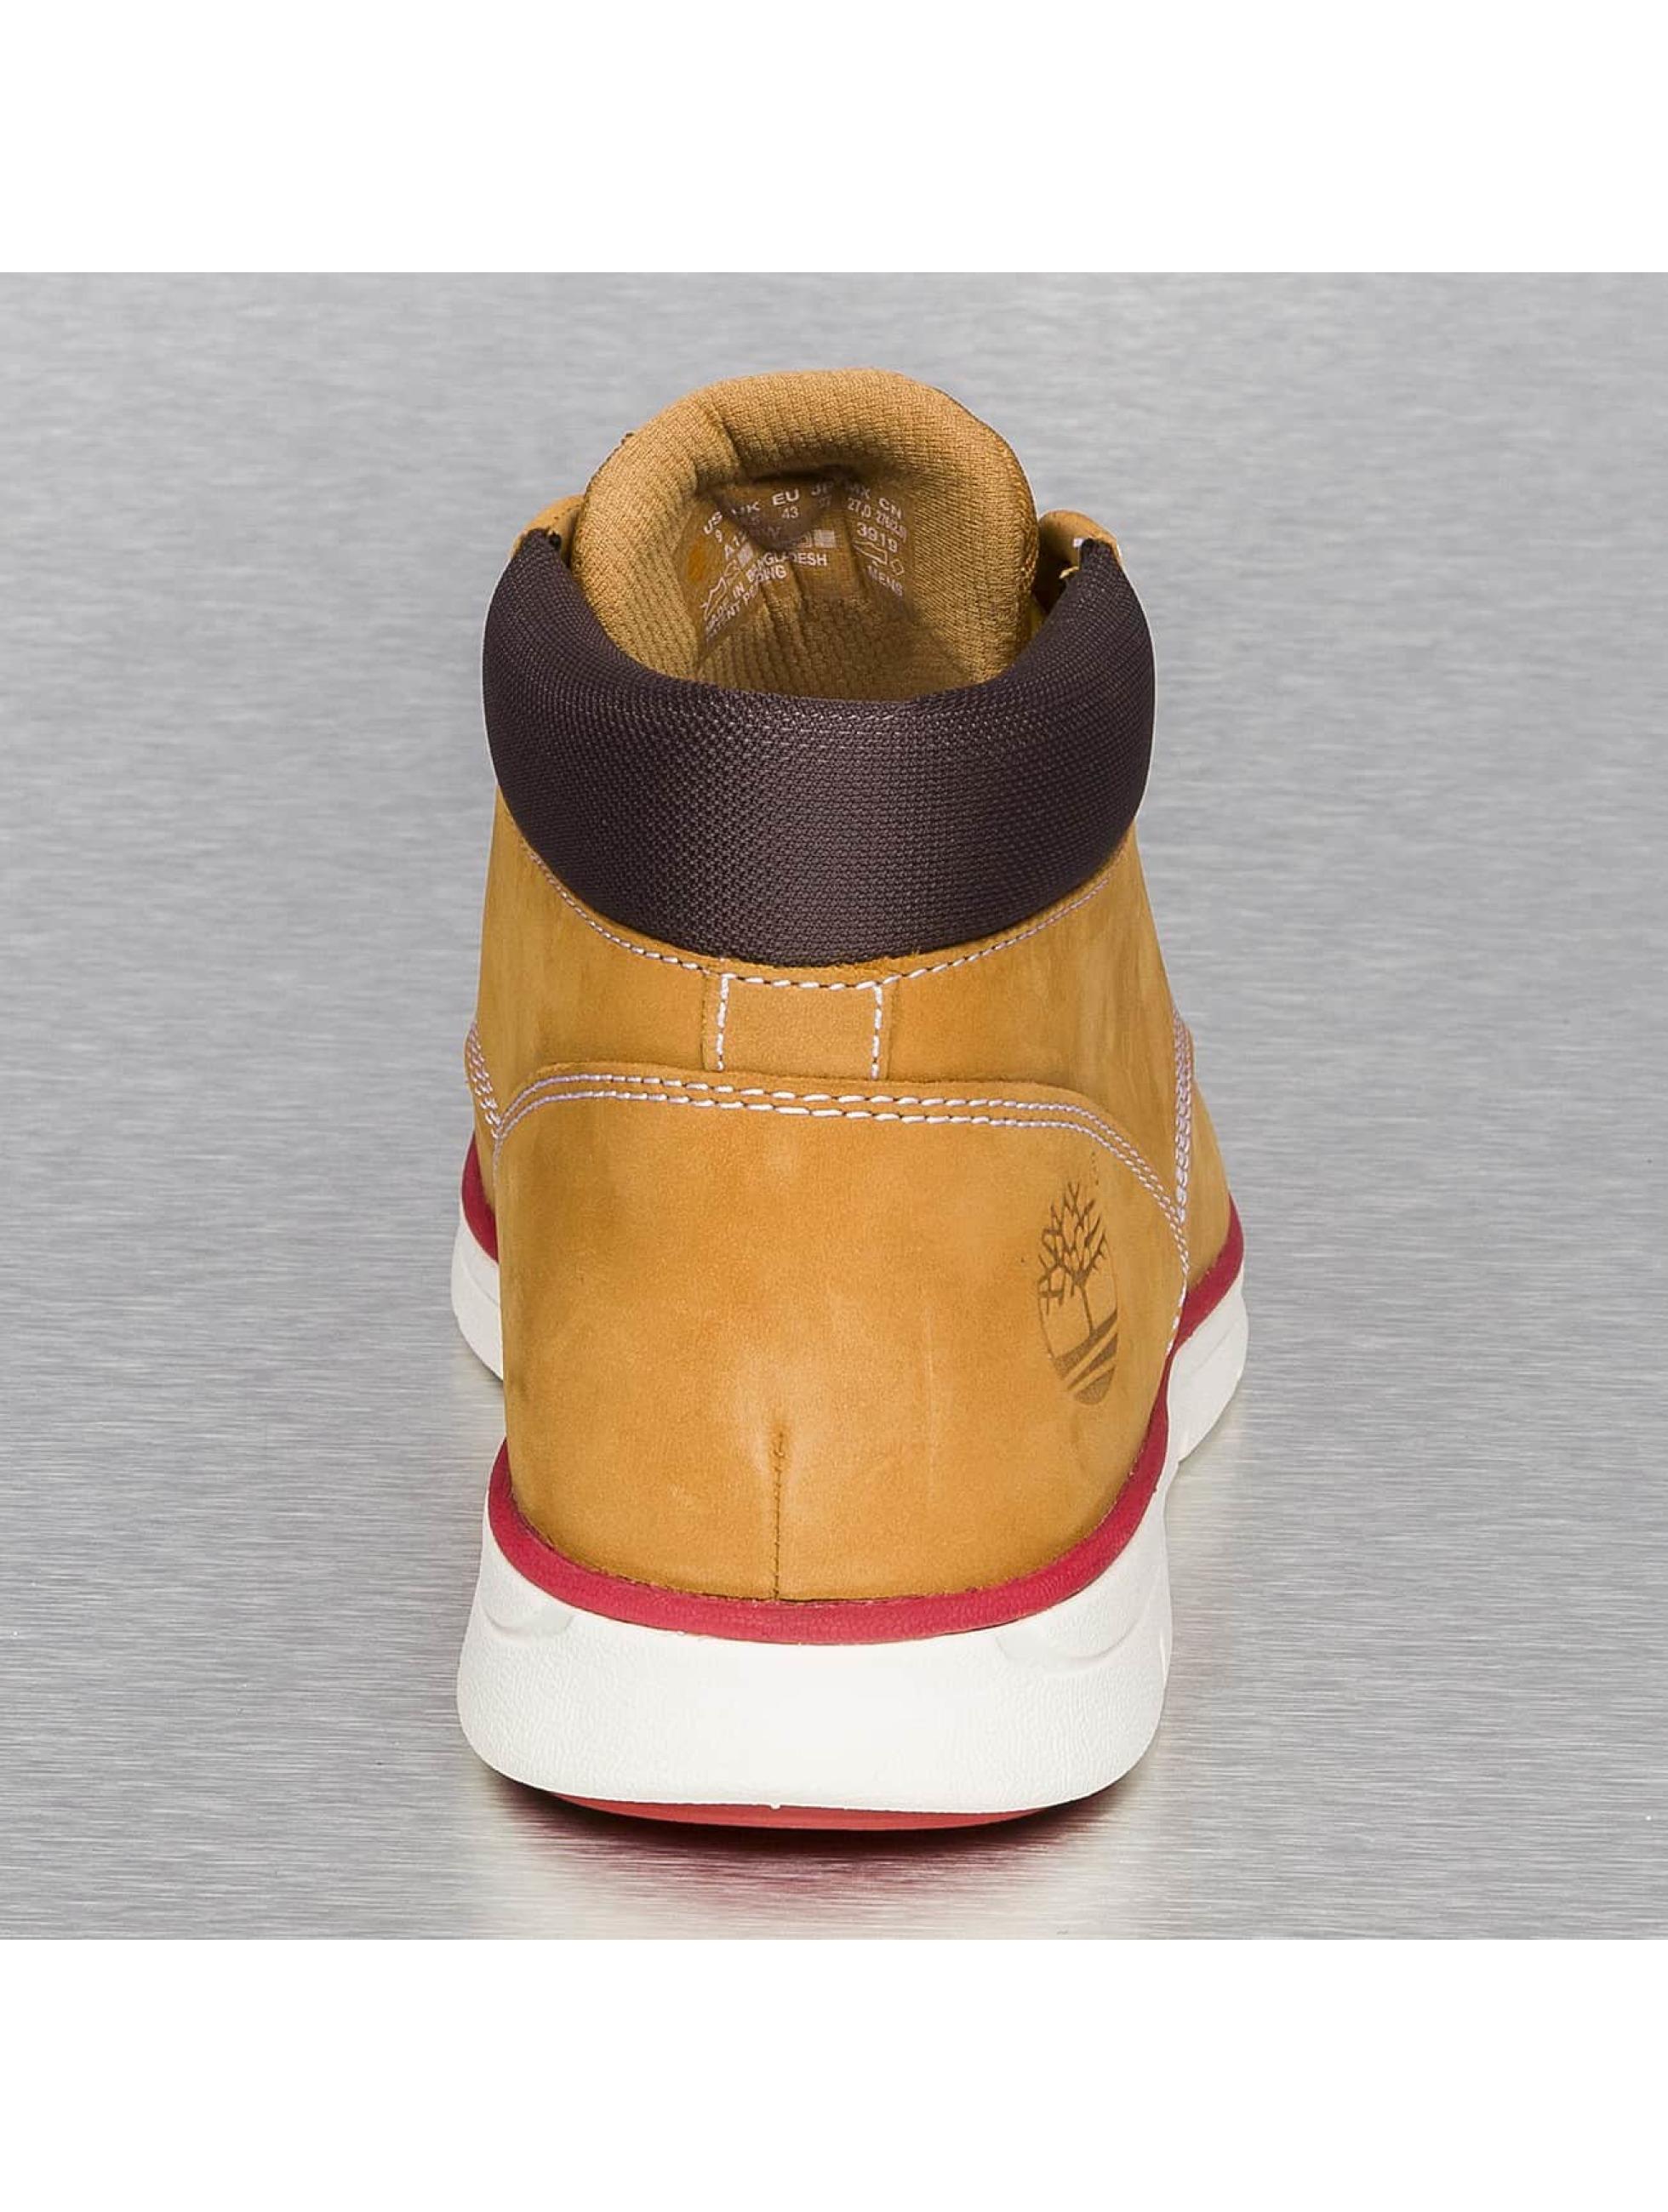 Timberland Baskets Chukka Leather beige